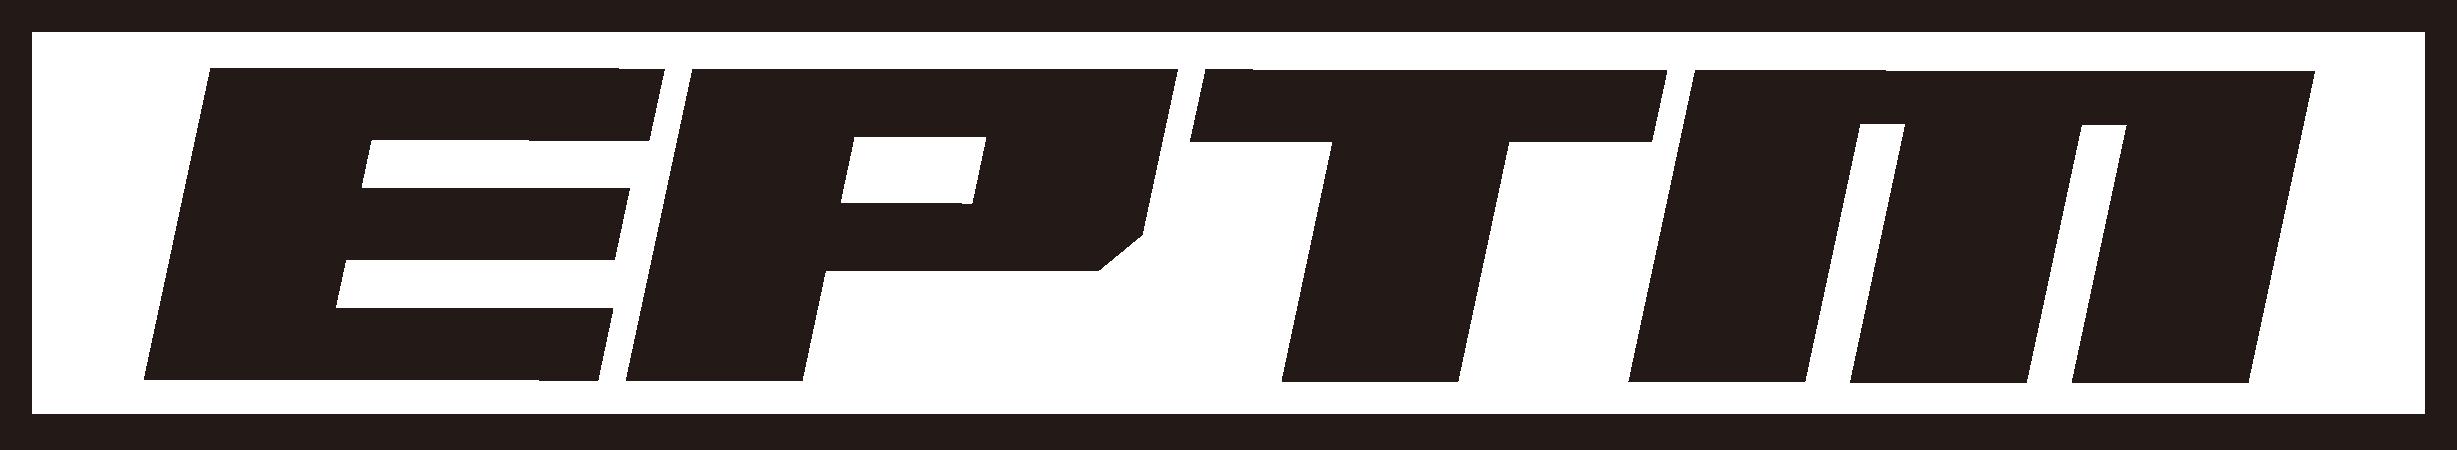 eptm-brand-logo-mens-streetwear-thedrop-logo.png